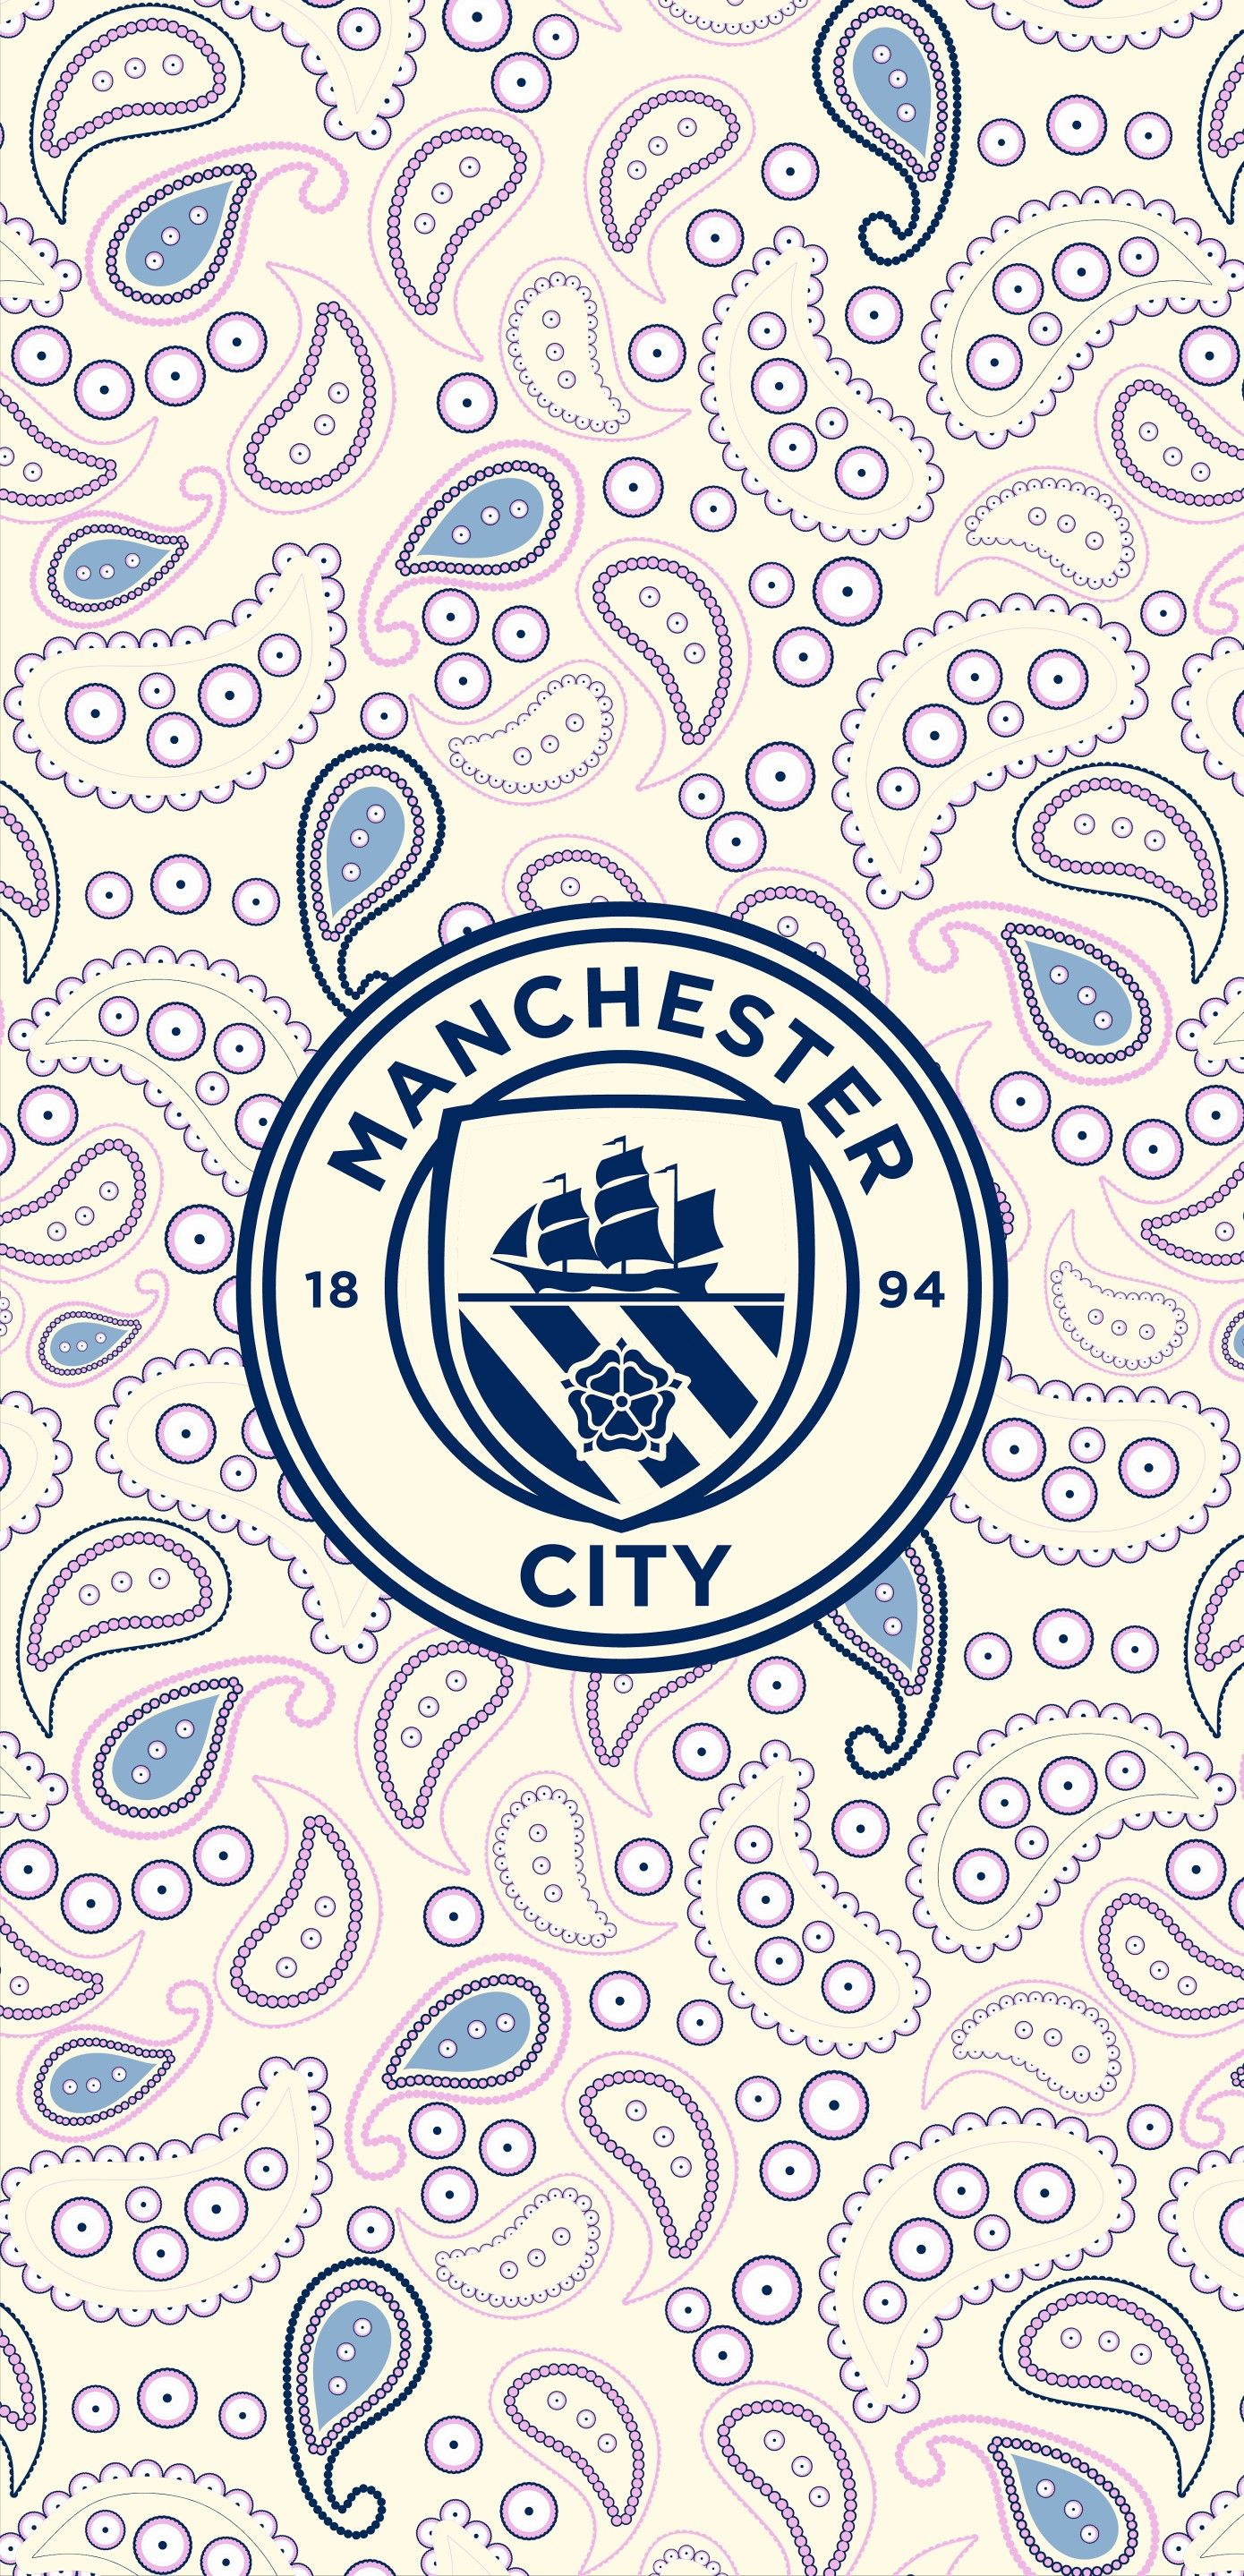 Man City Third Kit Phone Wallpaper Paisley Papel De Parede Futebol Arte De Basquete Uniformes Futebol